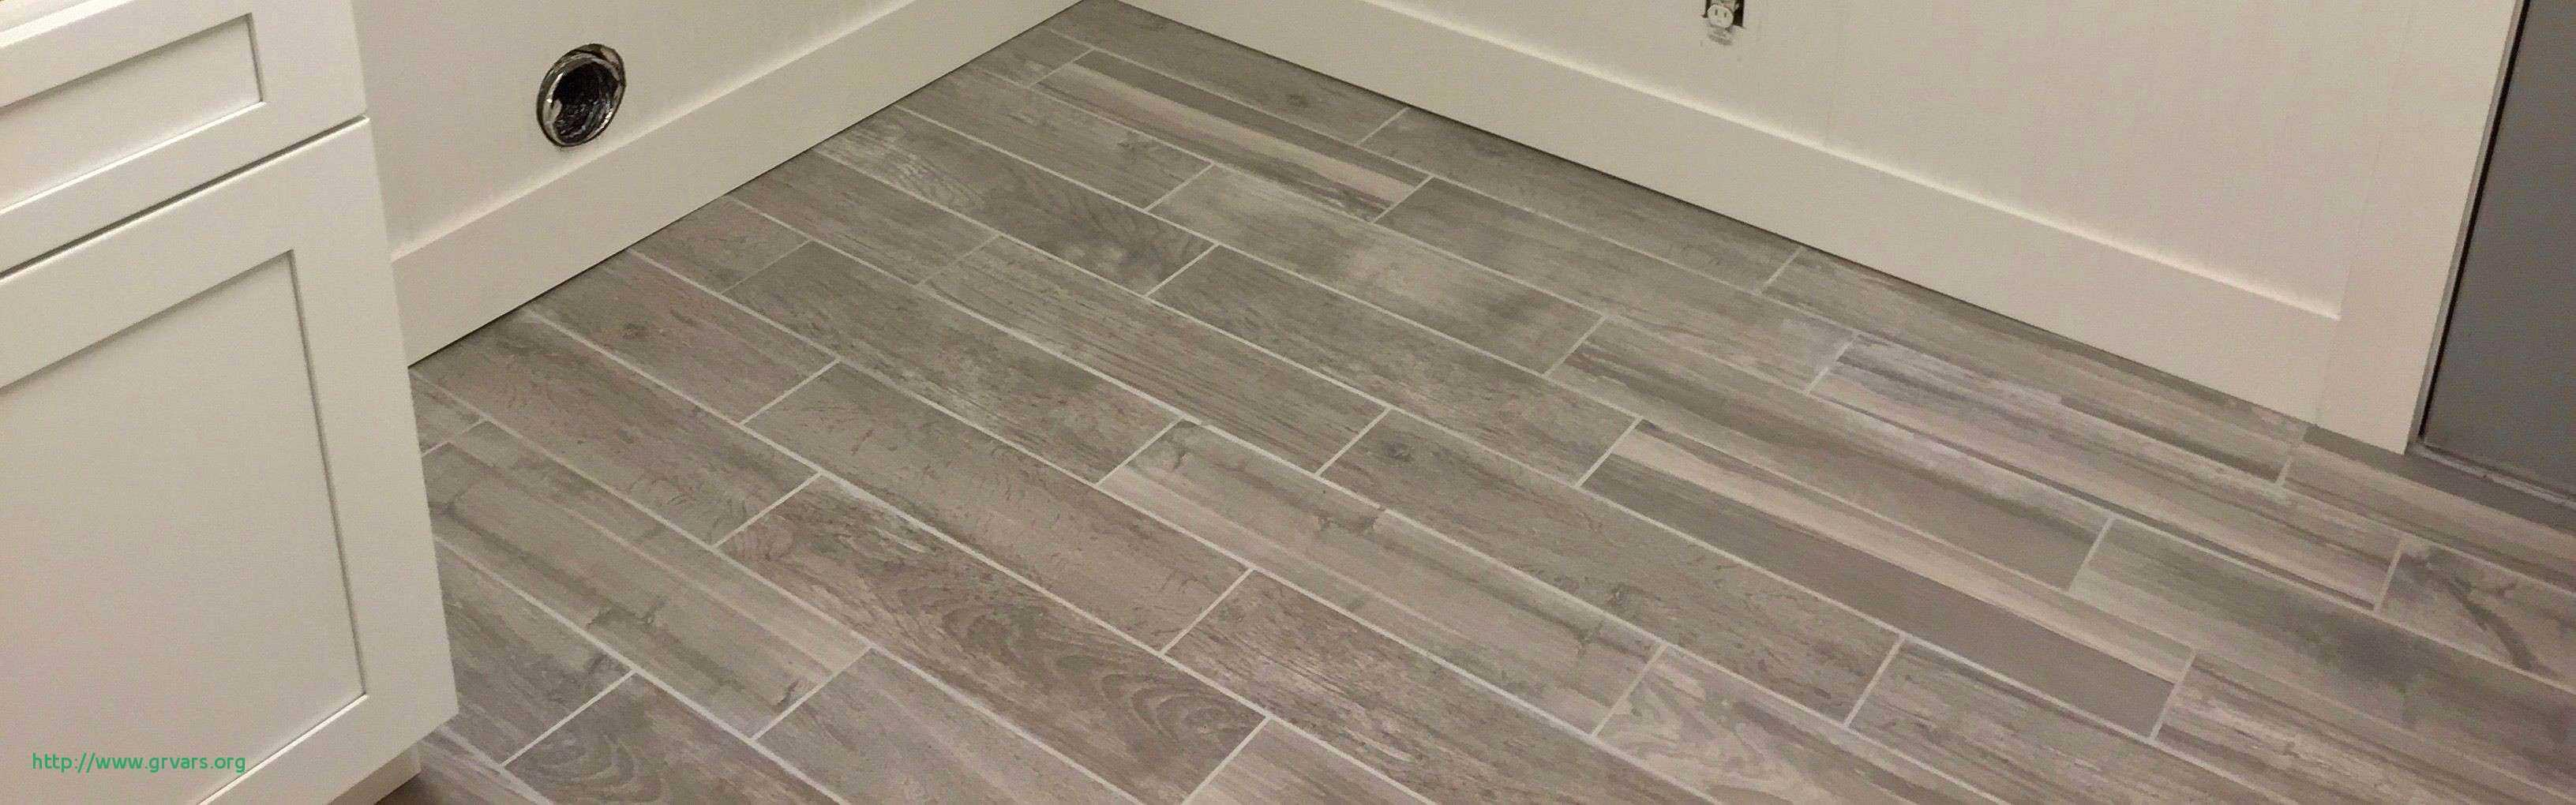 hardwood flooring adelaide of 21 nouveau cheap floor tiles adelaide ideas blog with unique bathroom tiling ideas best h sink install bathroom i 0d exciting beautiful fresh bathroom floor